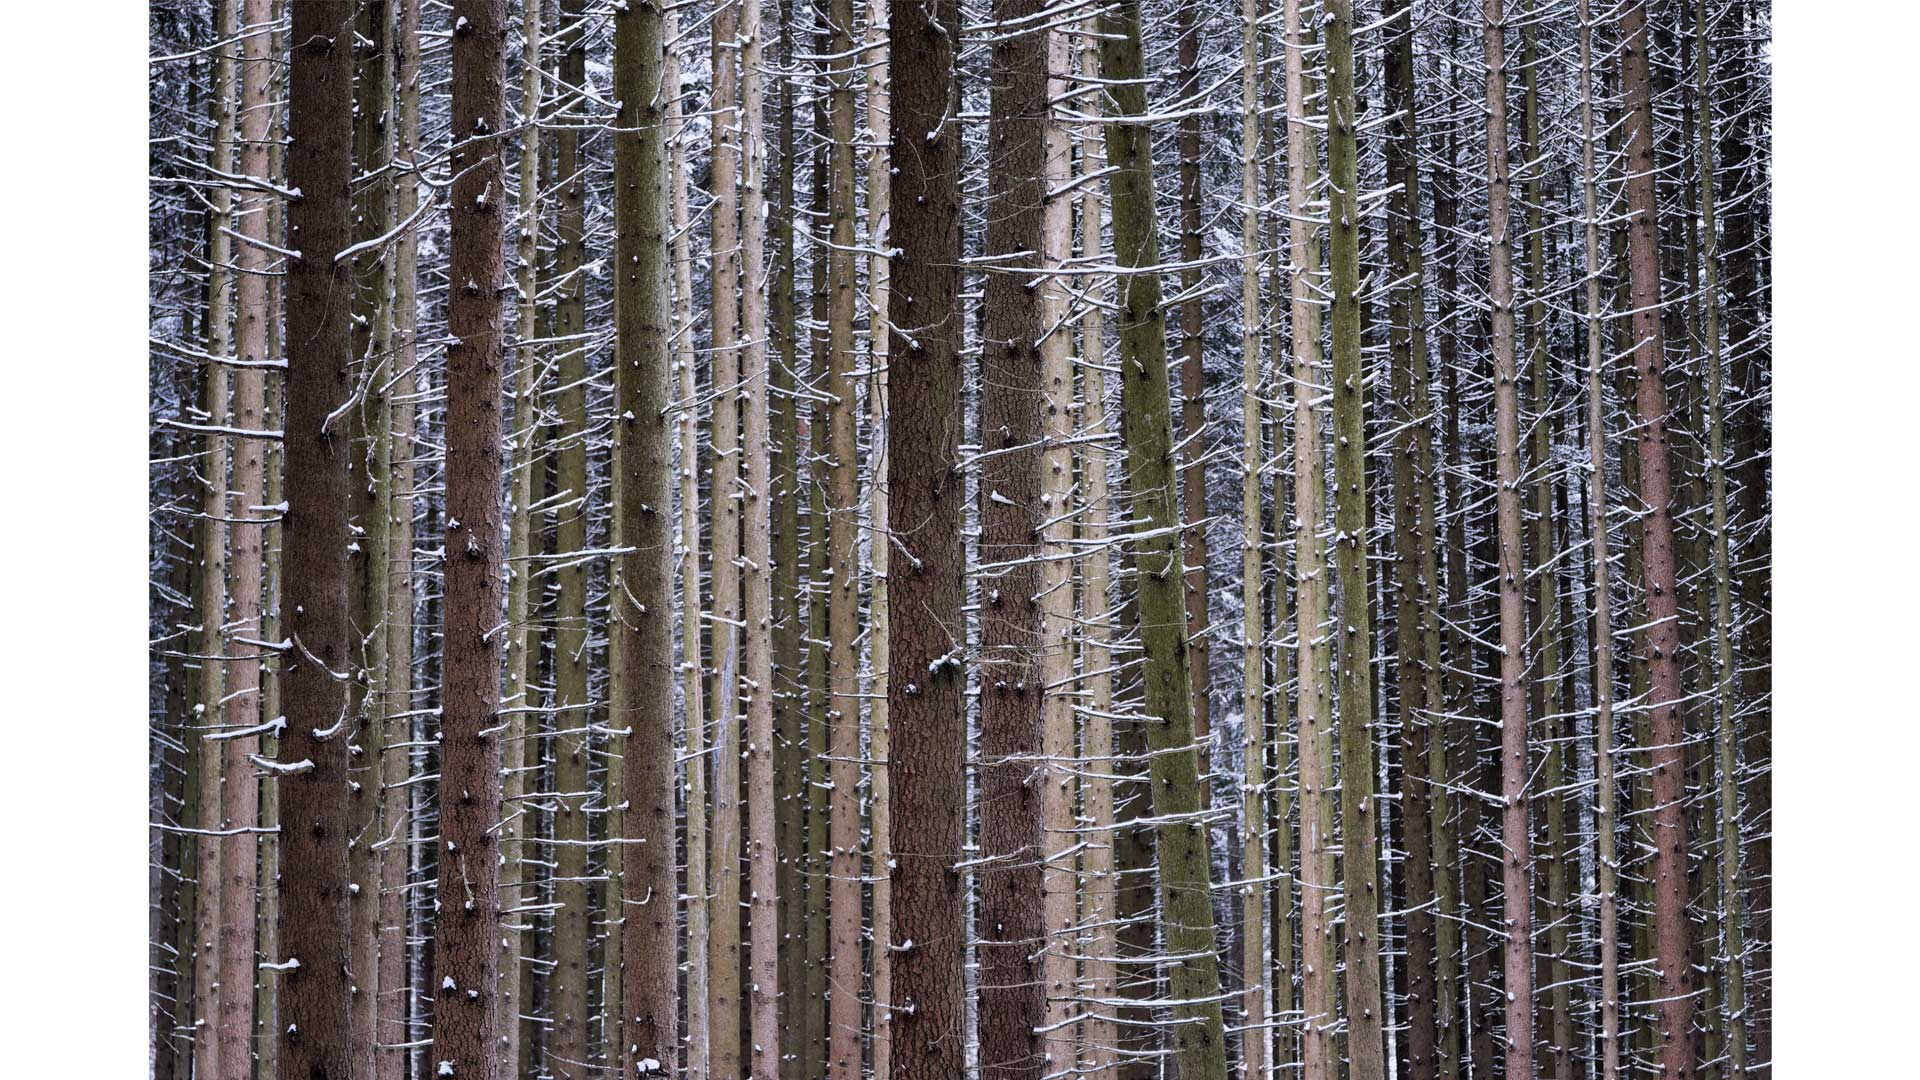 Winter – Suse Güllert Fotografie